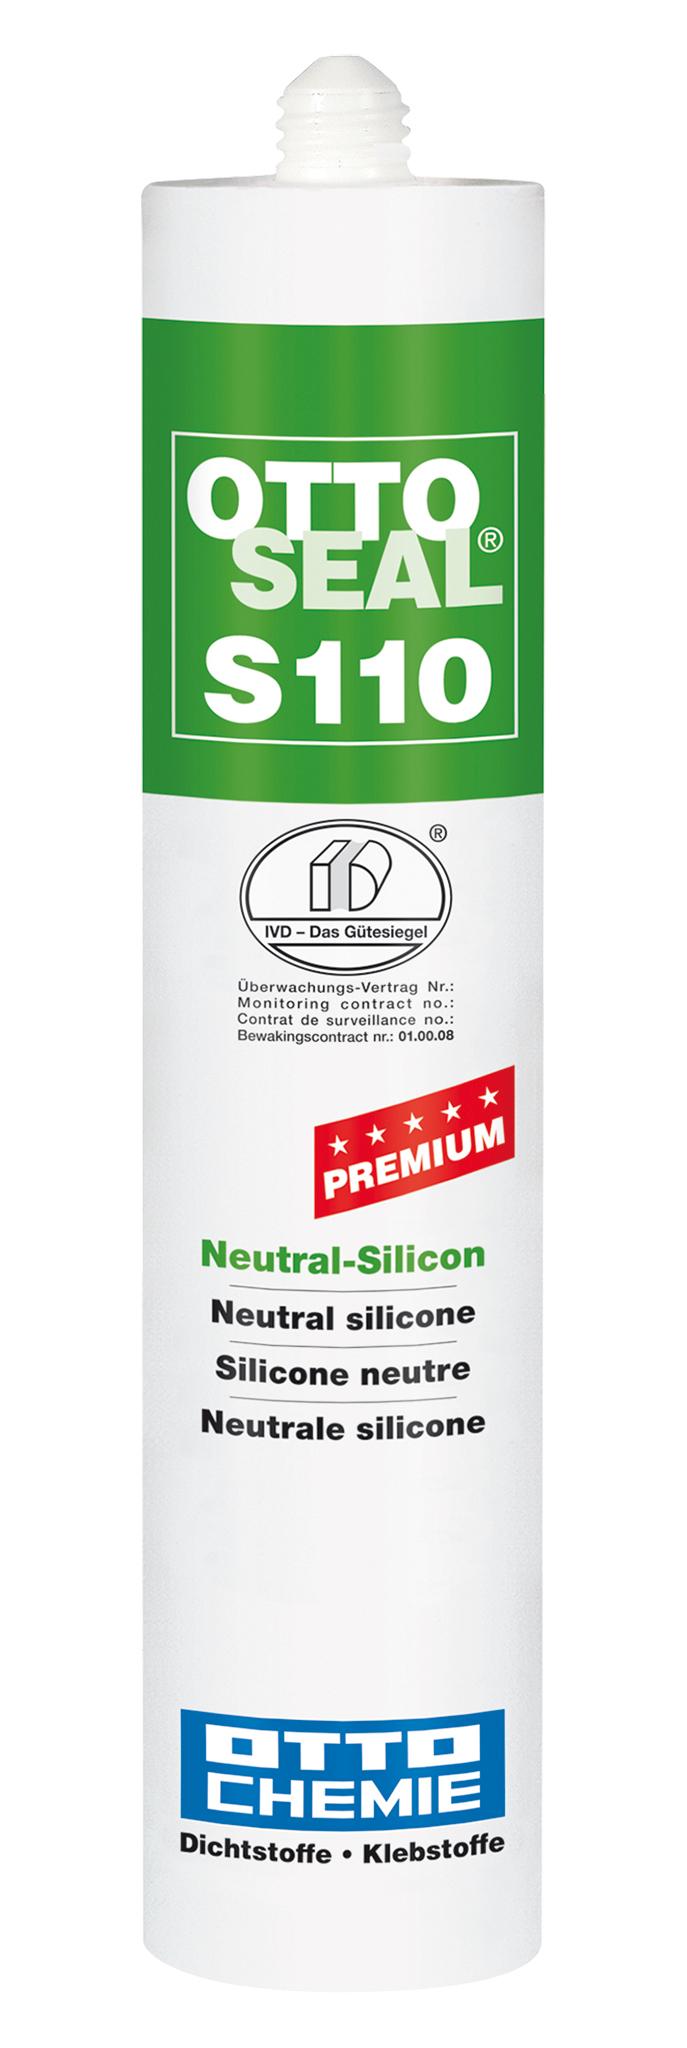 Joint Sealing Silicone Matt-Brown 310 ml